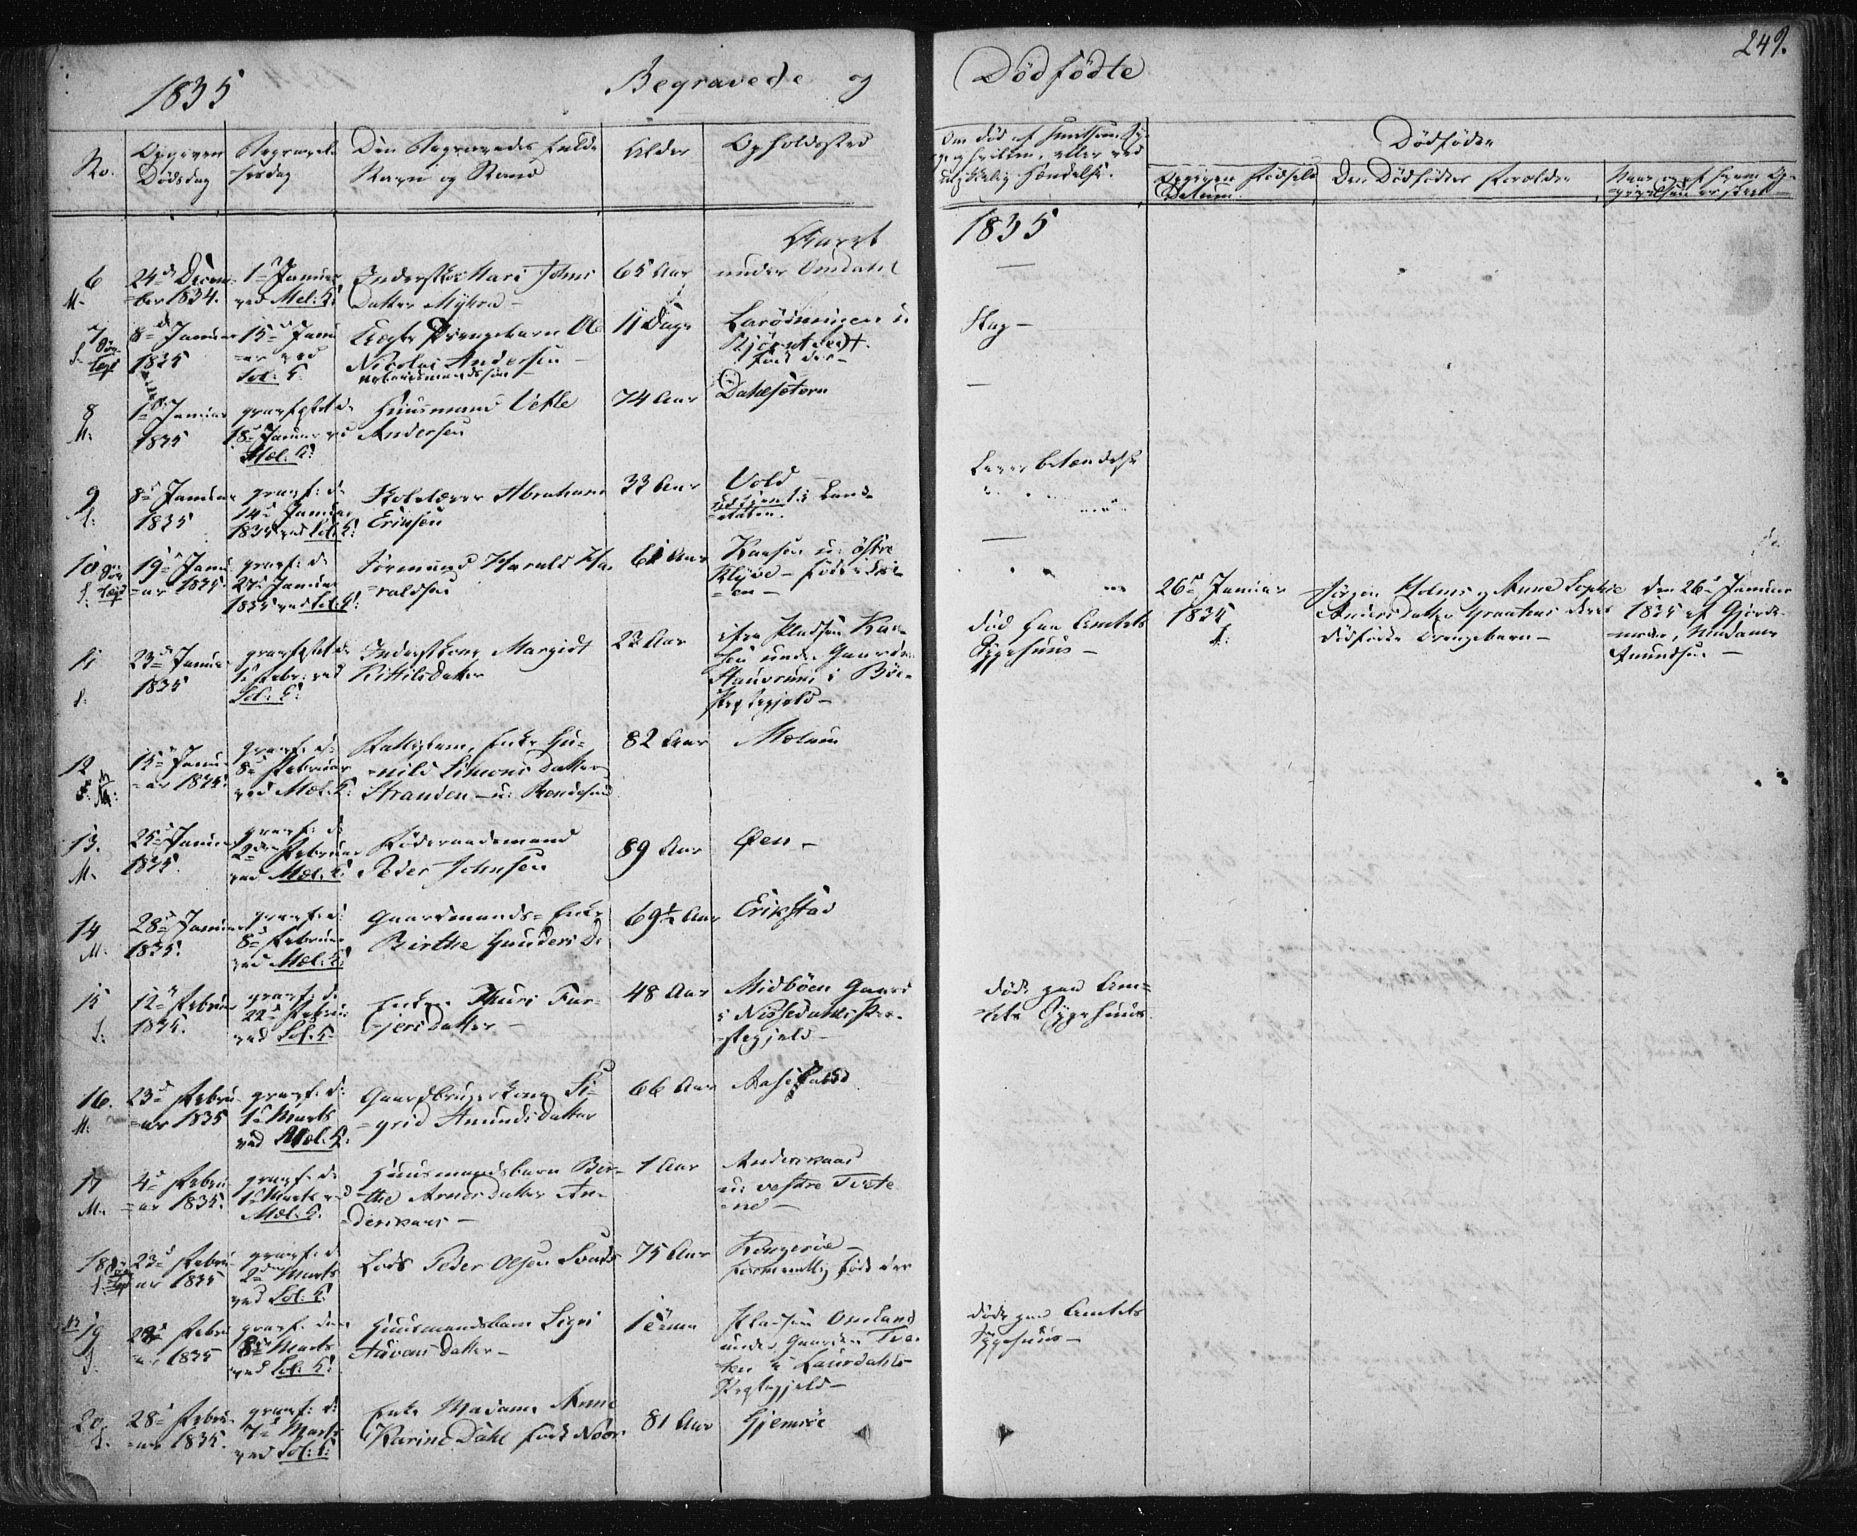 SAKO, Solum kirkebøker, F/Fa/L0005: Ministerialbok nr. I 5, 1833-1843, s. 249